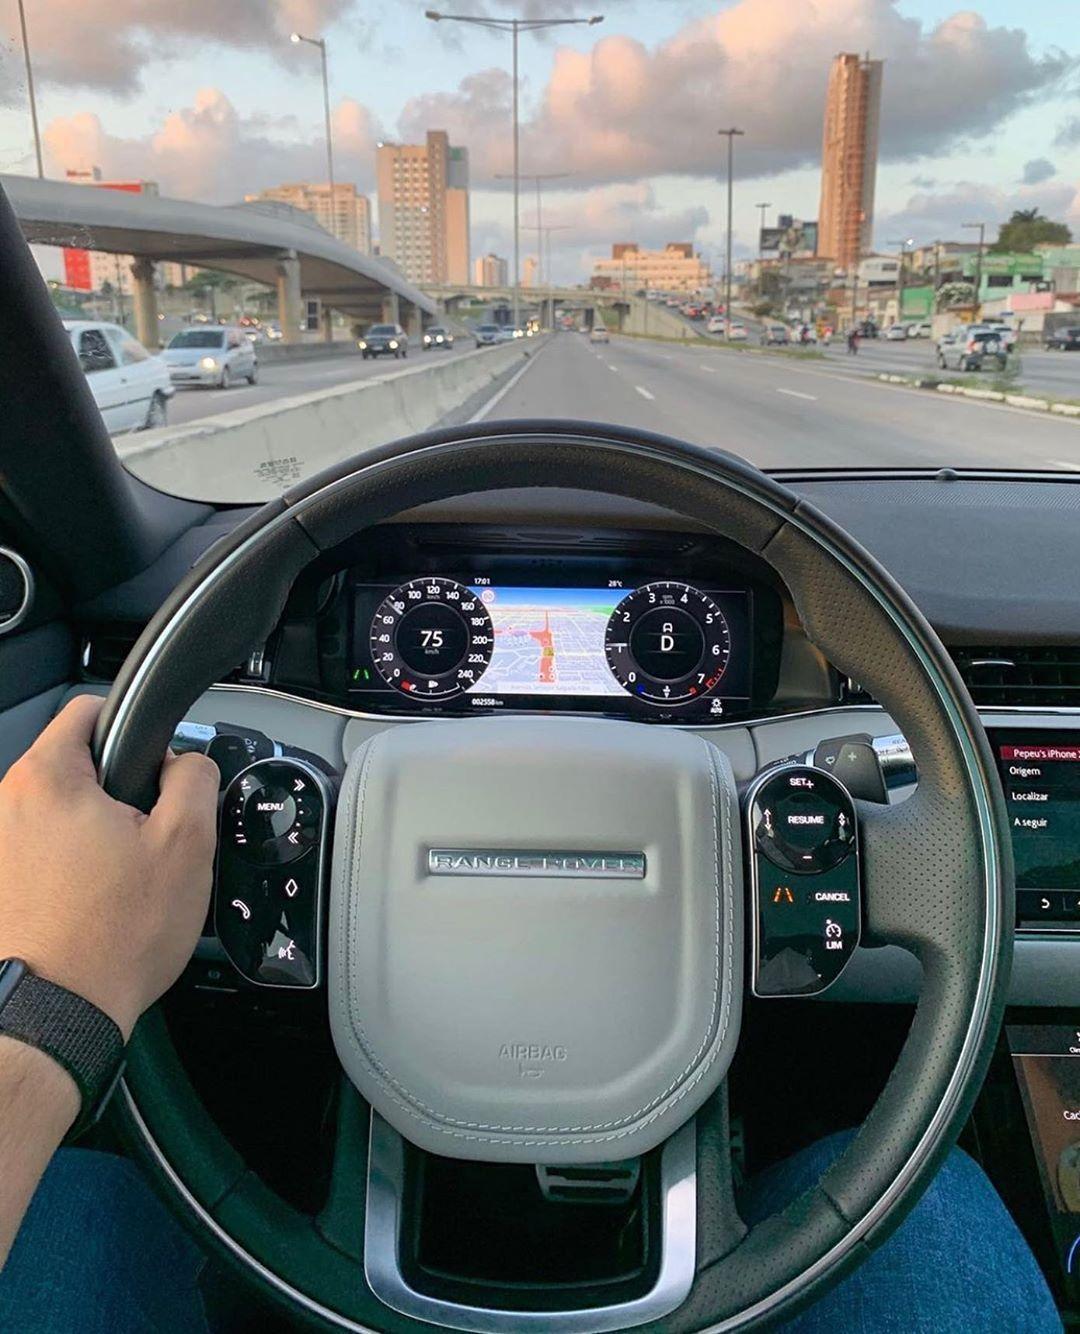 Range Rover Fan Club on Instagram Let The Journey Begin      aceleramaxima Effektive Bilder die wir  Bike Girl Bronco Wrangler TJ Energy Circus Tacoma